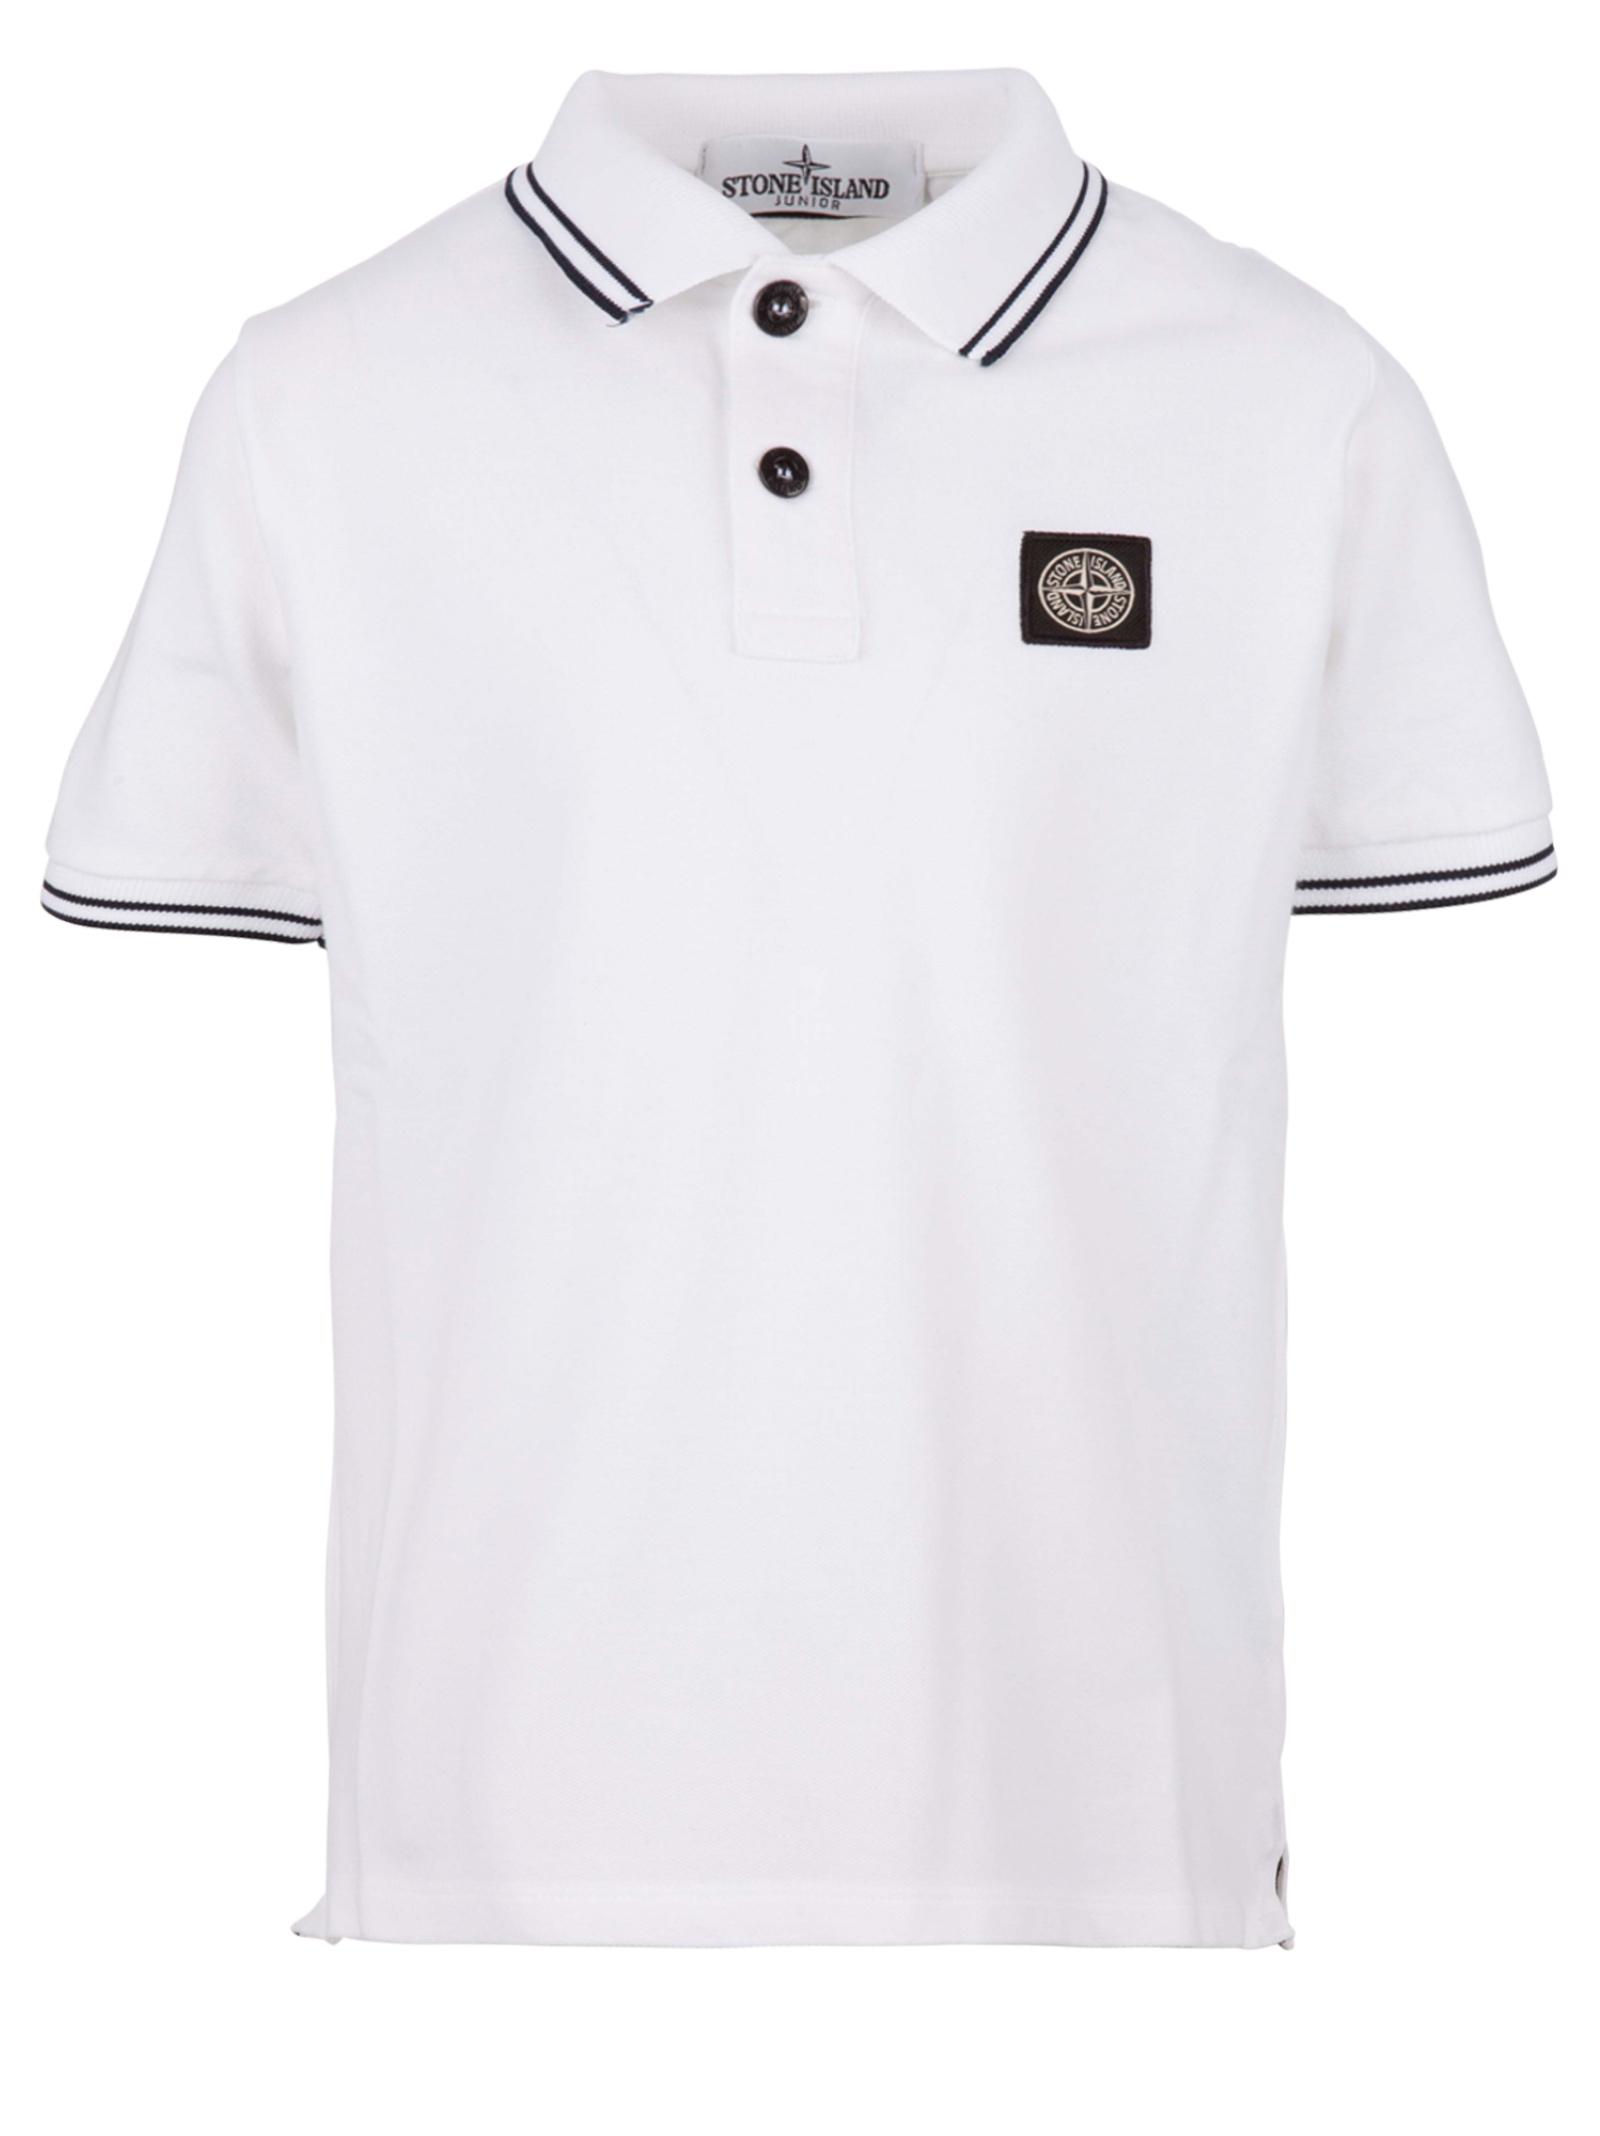 c756174713d Stone Island Kids polo shirt - Stone Island Junior - Michele Franzese Moda